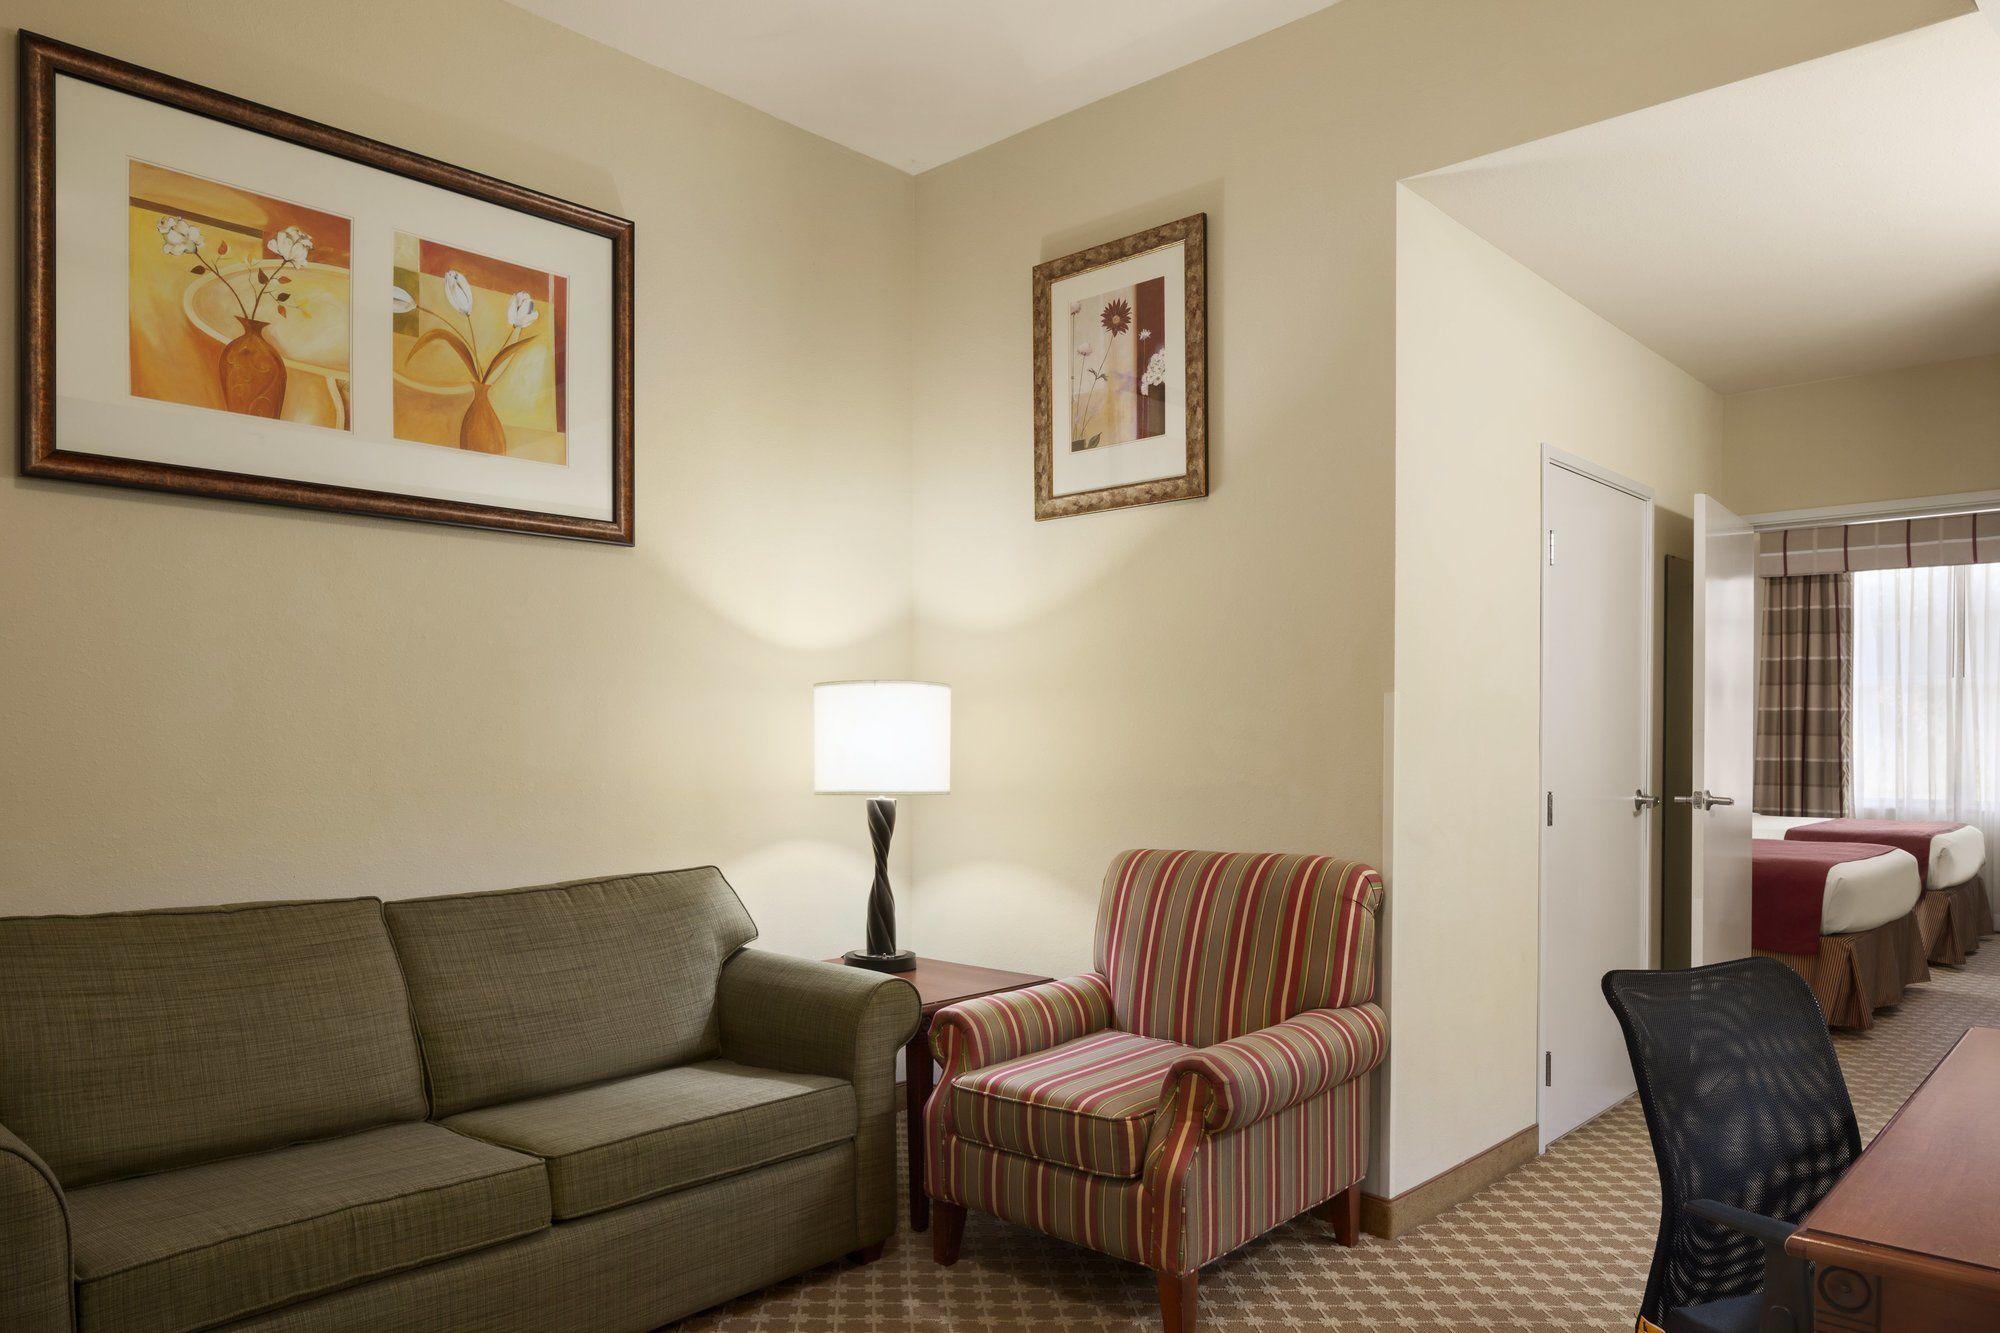 Country Inn & Suites in Crestview, FL